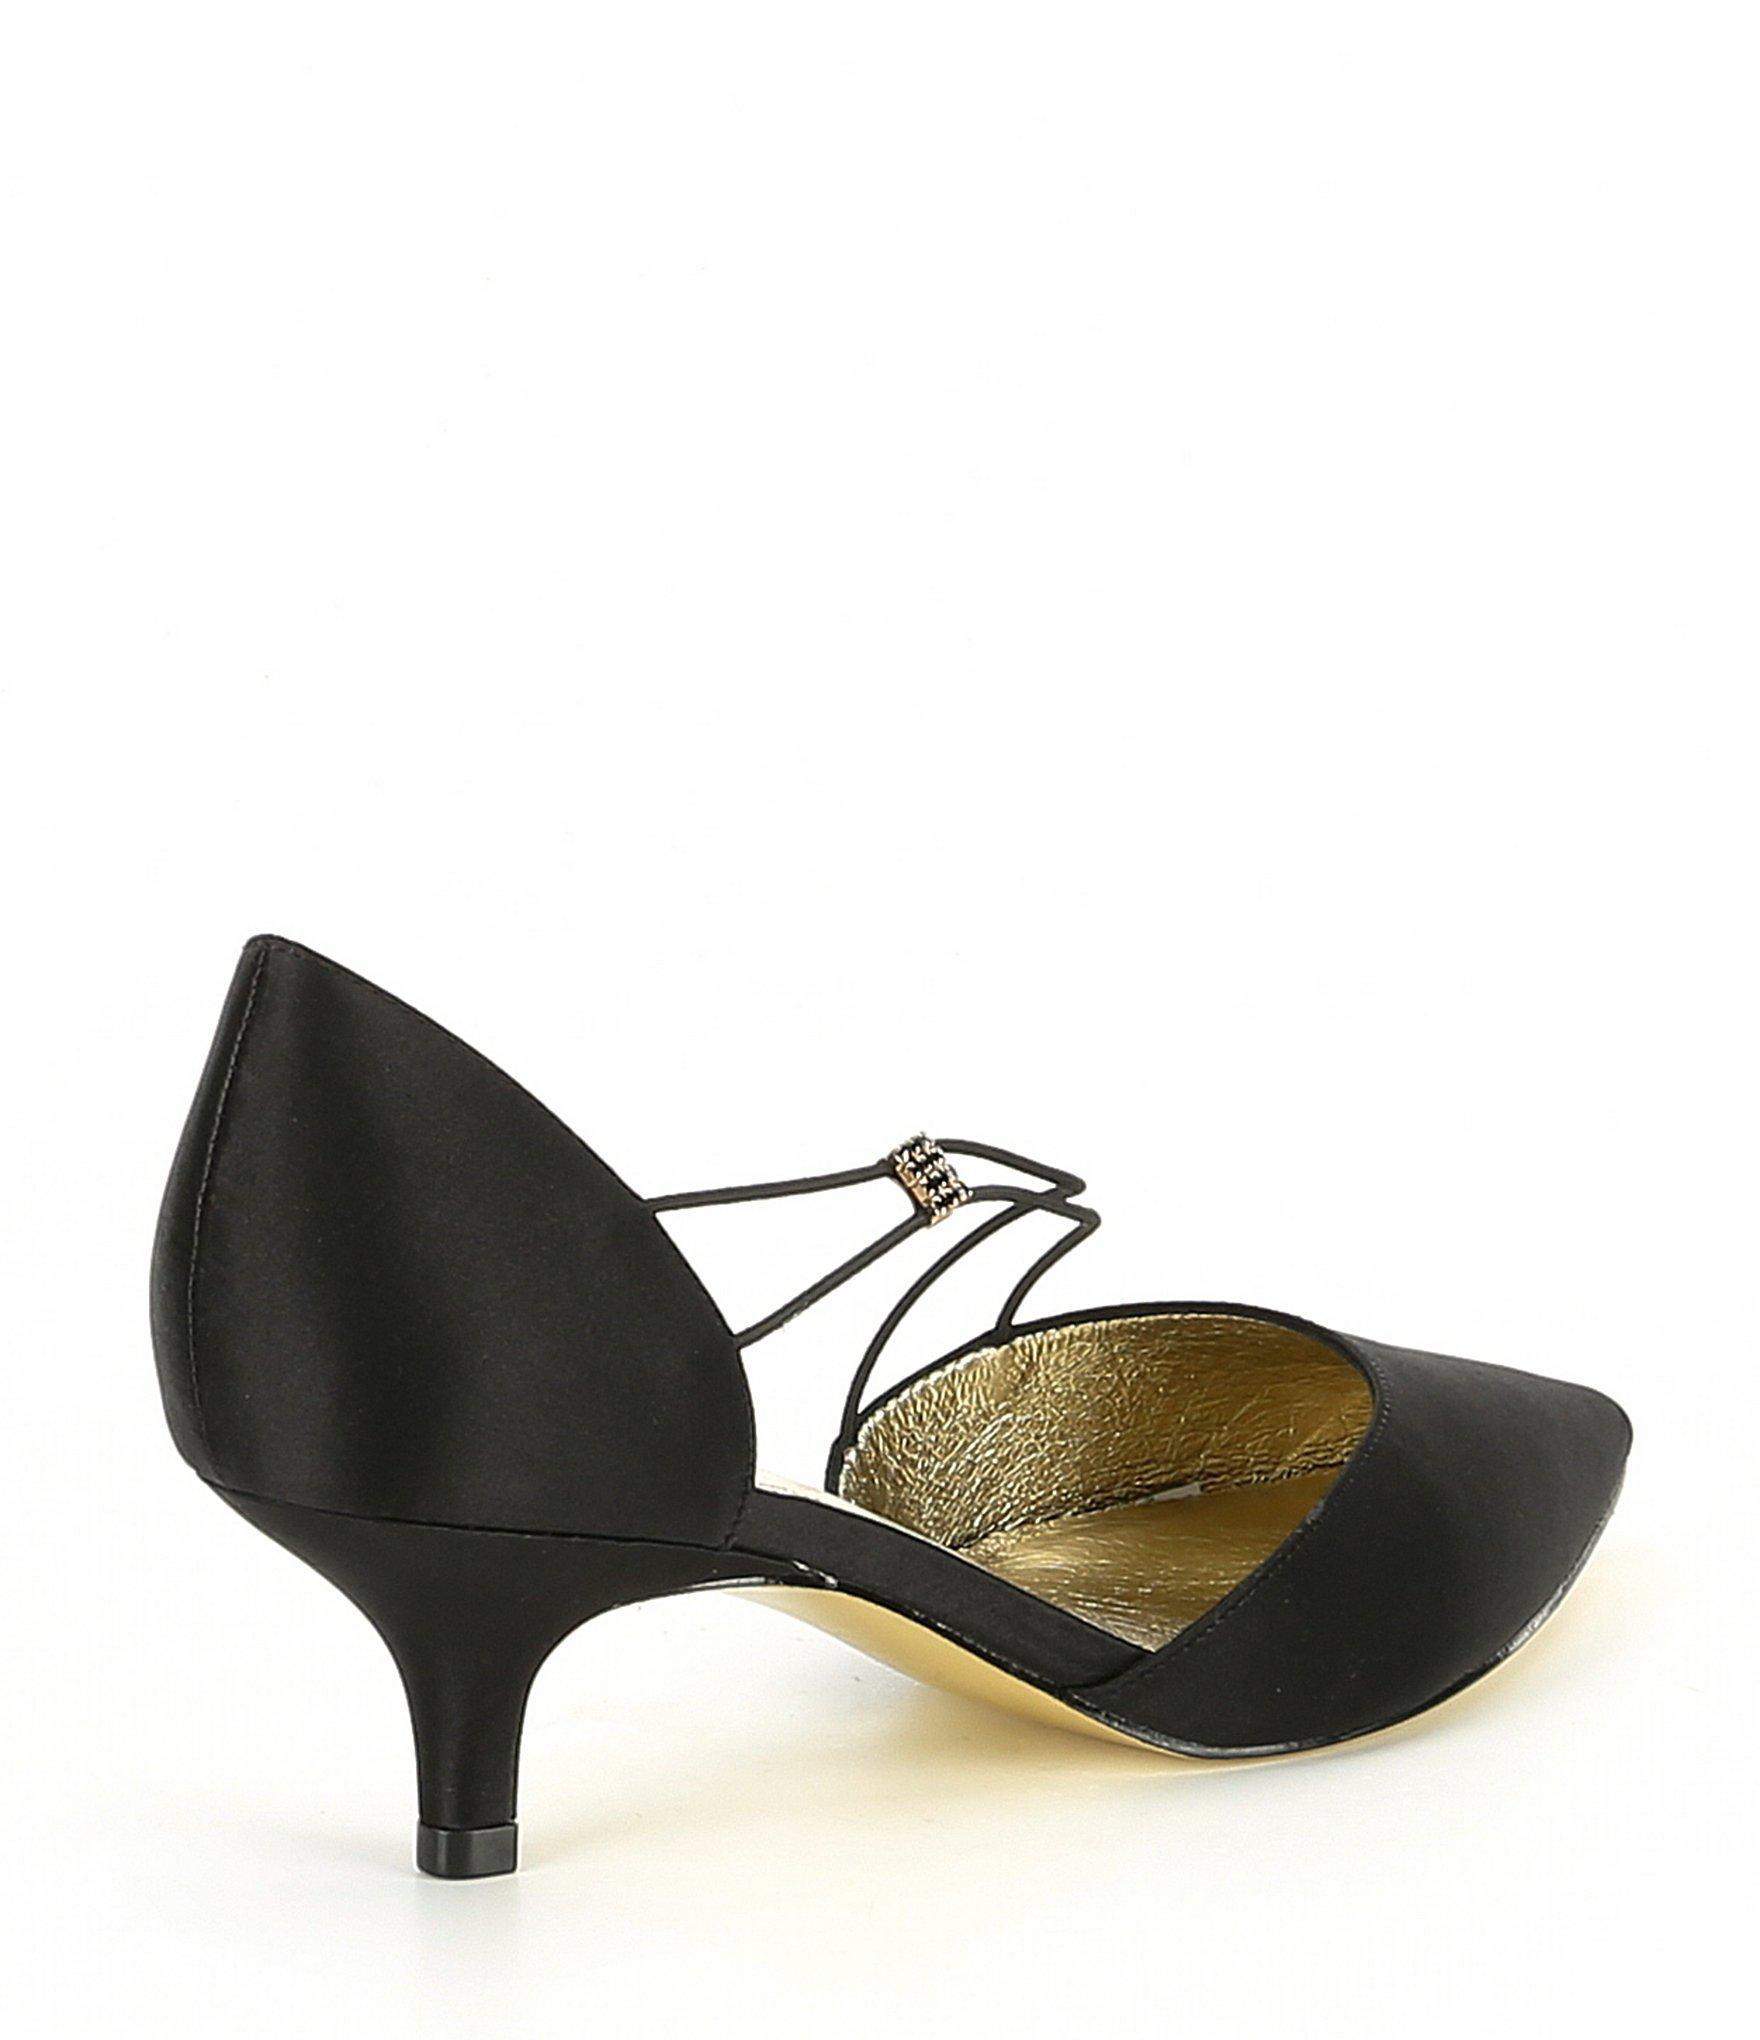 69dd66d19dbd9 Adrianna Papell - Black Lacy Asymmetrical Satin Kitten Heel Pumps - Lyst.  View fullscreen